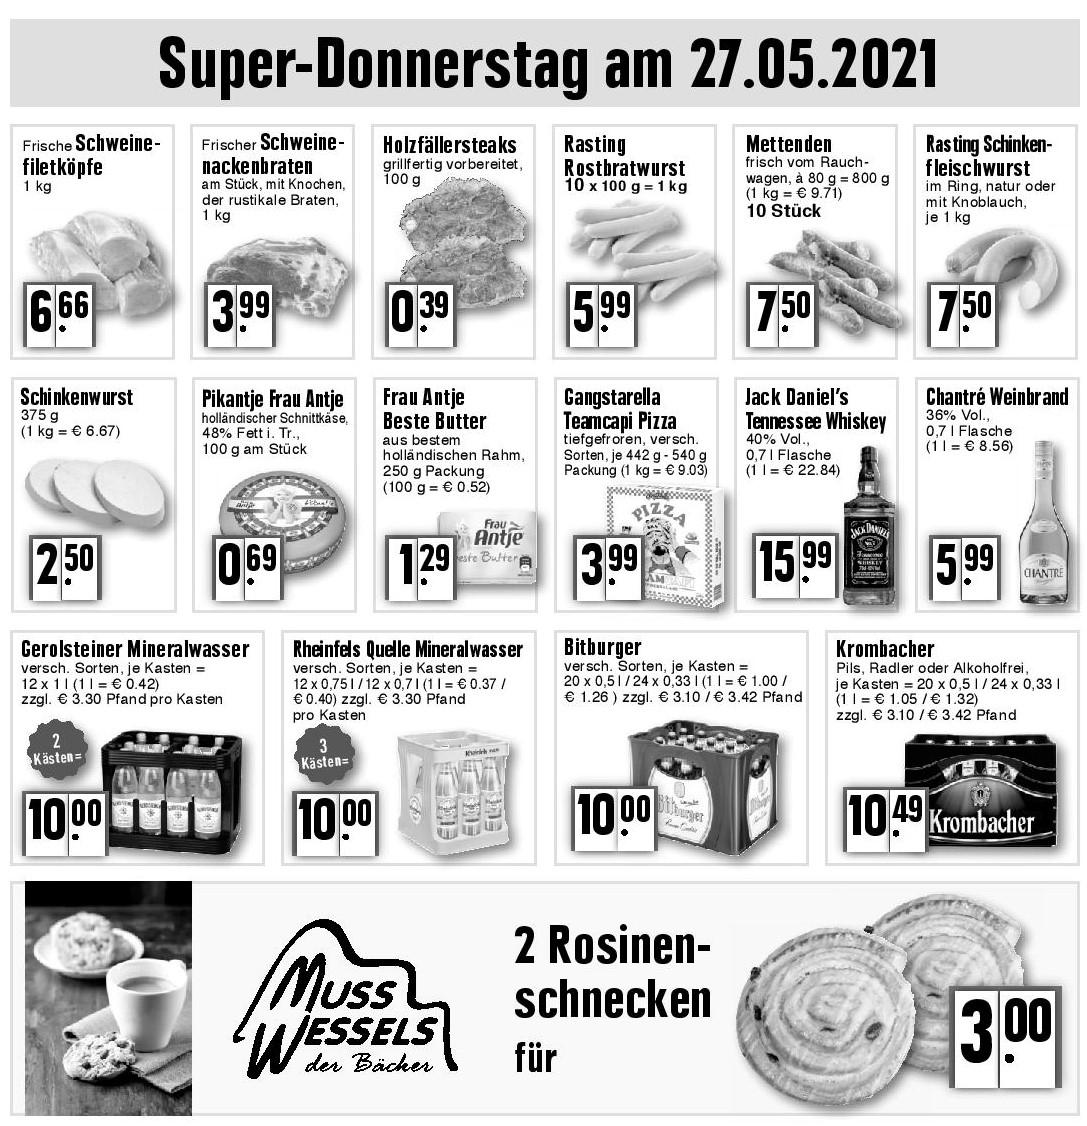 Super-Donnerstag am 27.05.2021